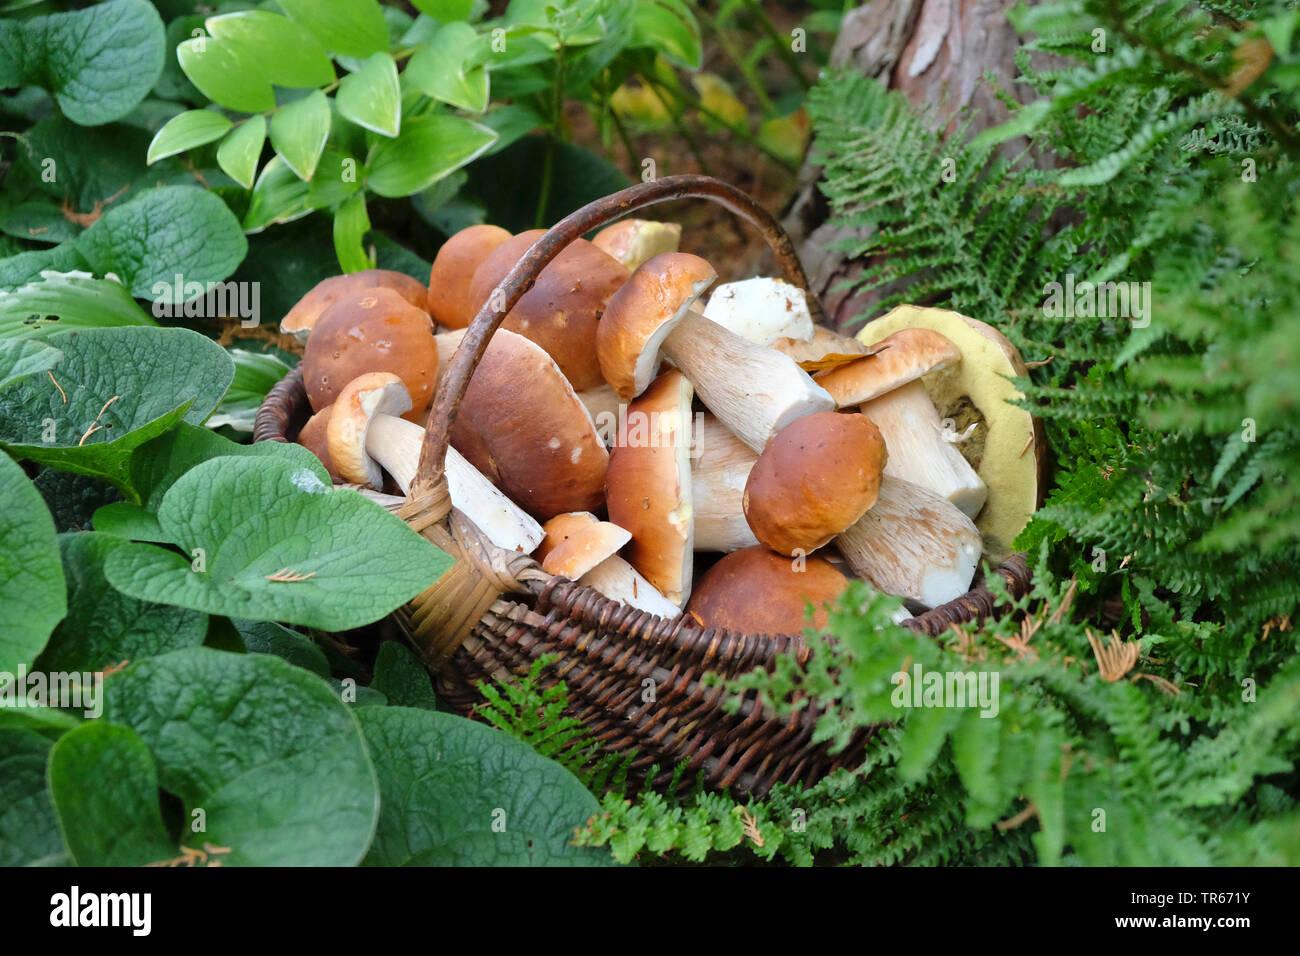 Steinpilz, Stein-Pilz, Fichten-Steinpilz, Fichtensteinpilz, Edelpilz, Edel-Pilz, Herrenpilz, Herren-Pilz (Boletus edulis), Steinpilze in einem Korb, D - Stock Image